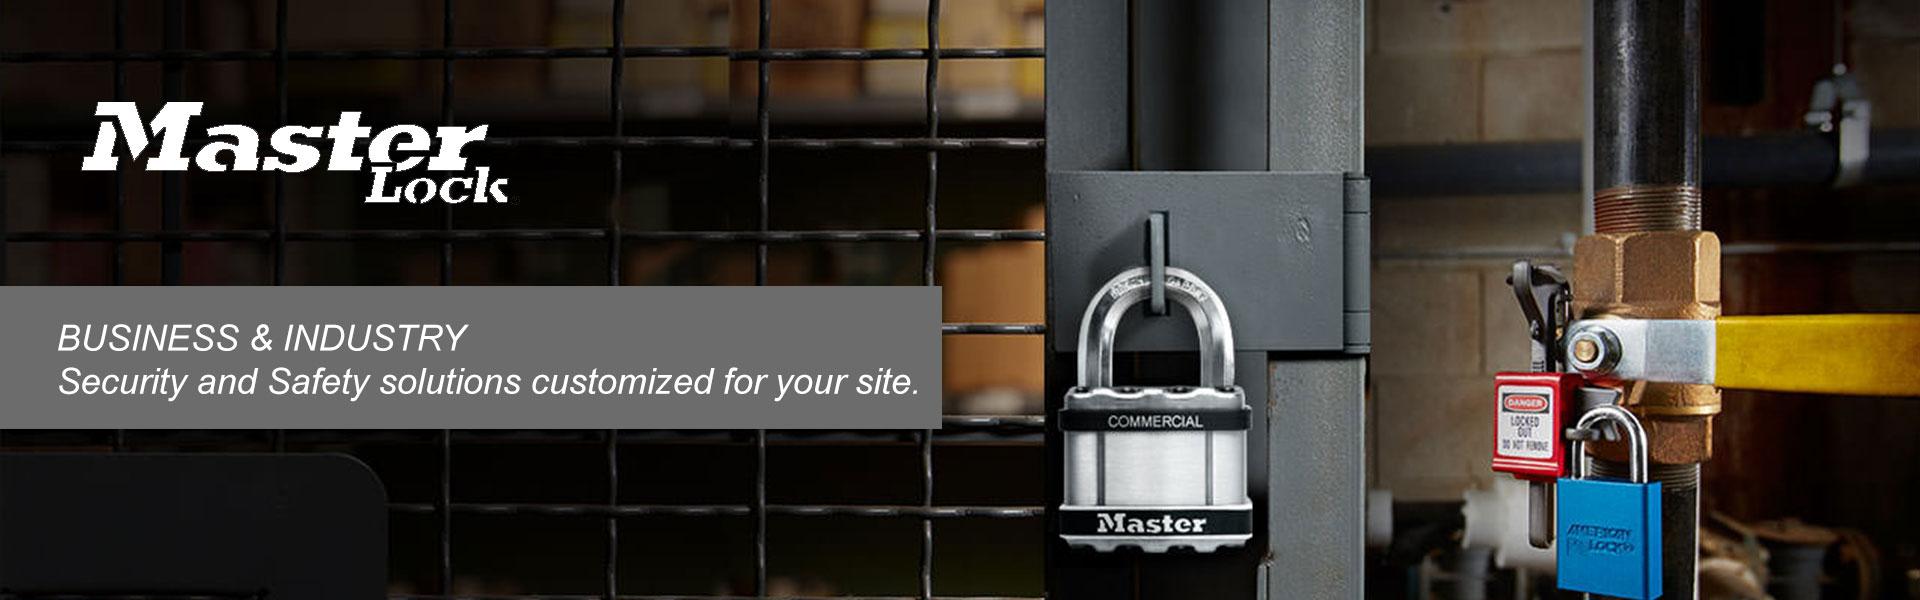 master-lock-banner.jpg